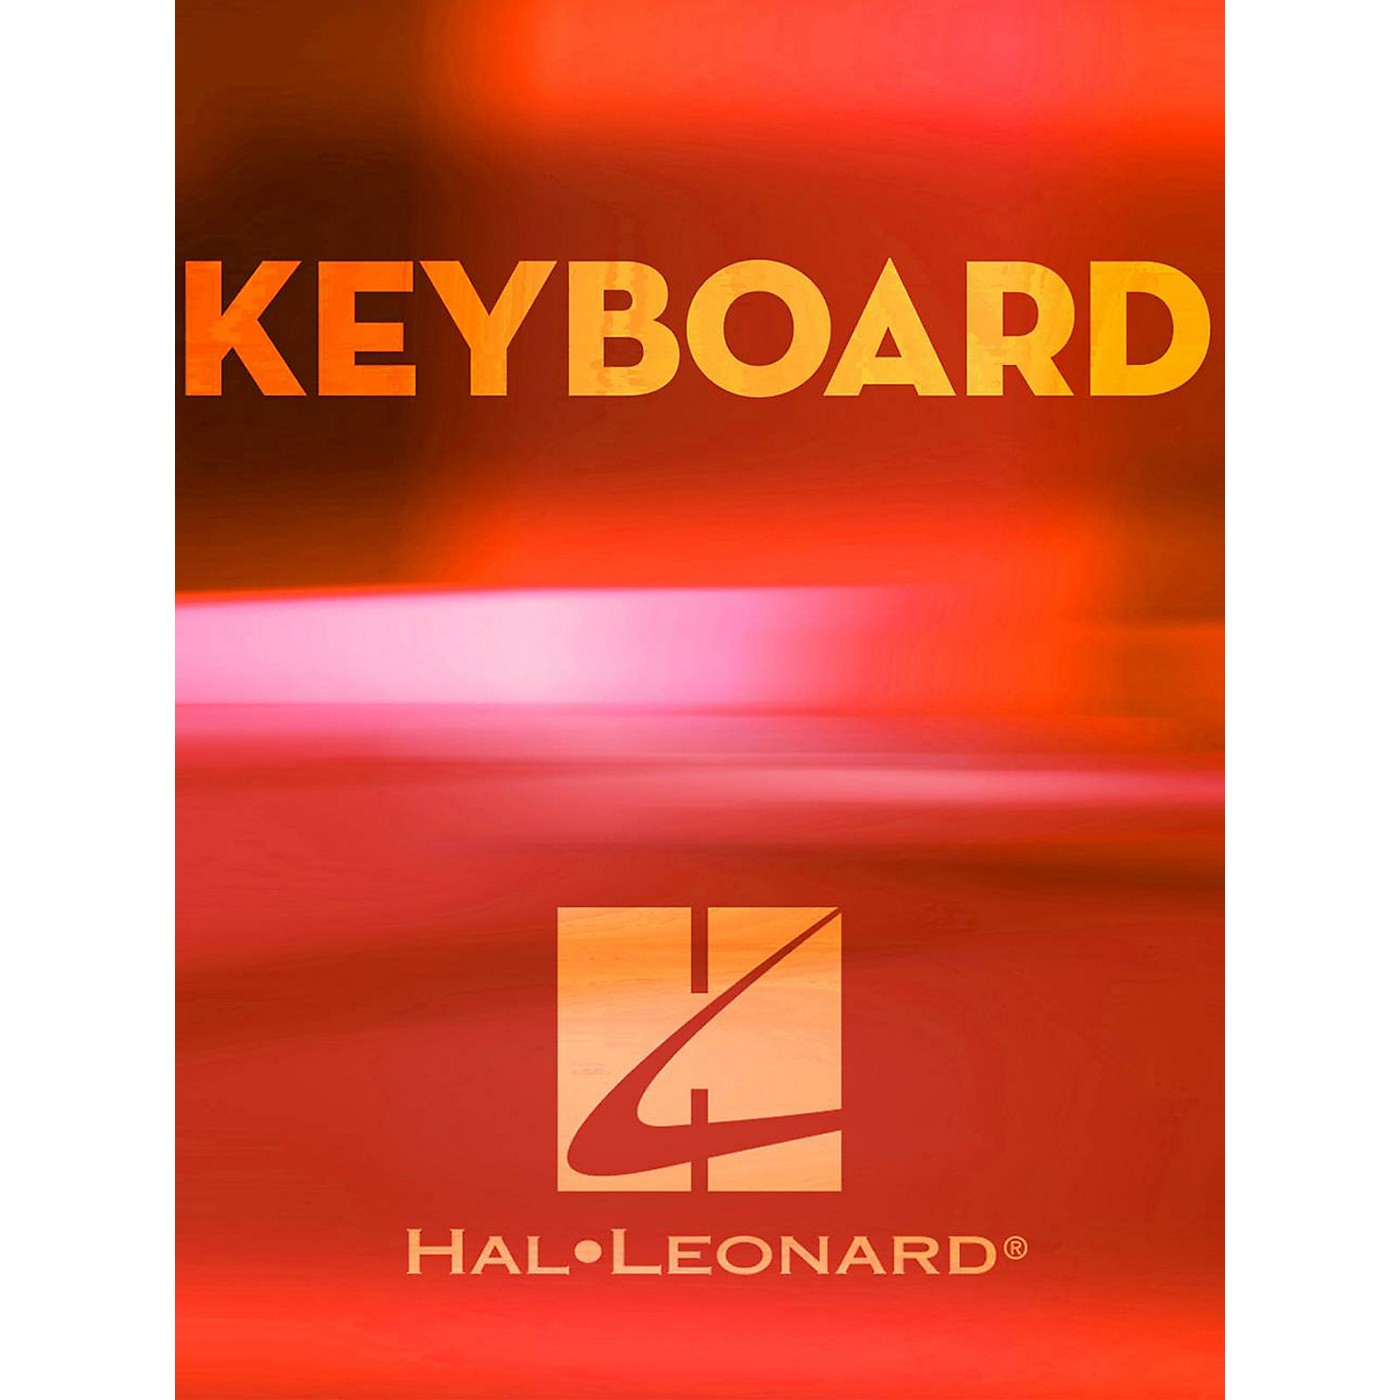 Hal Leonard More Hymns For Praise And Worship Finale Cd-rom Baritone Sax Sacred Folio Series CD-ROM thumbnail